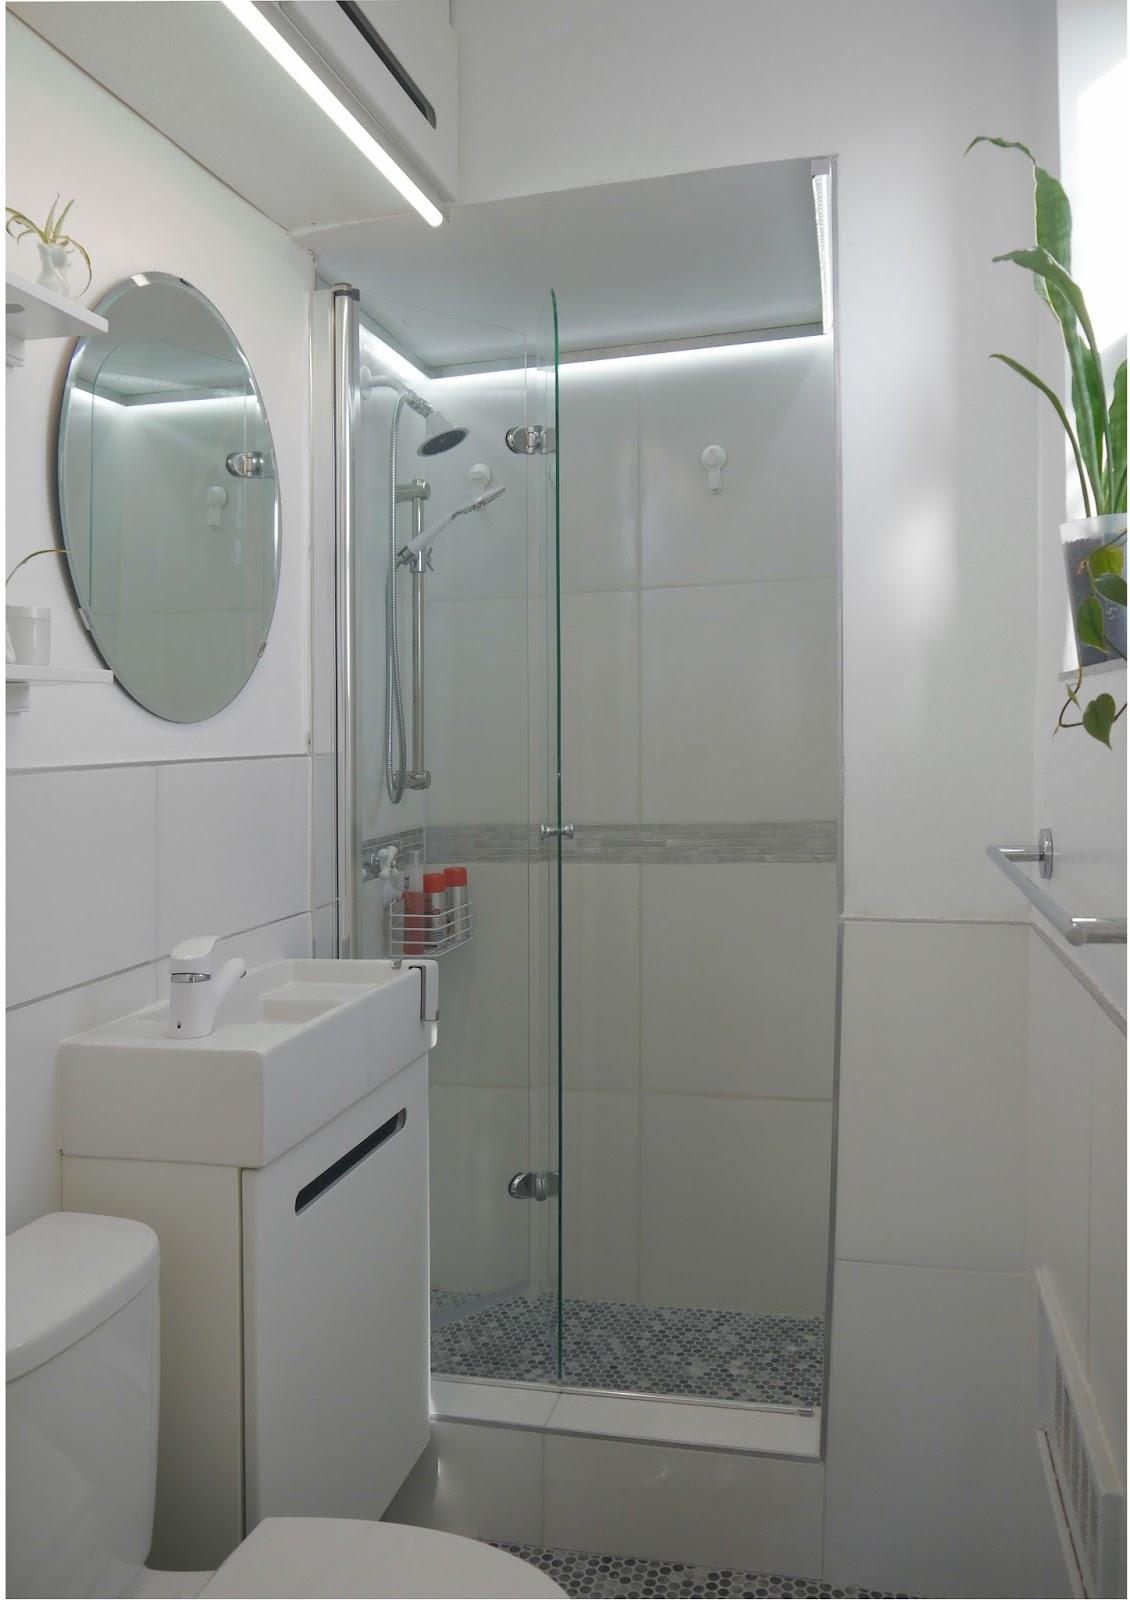 Bubolina Amp Bublico Blog Micro Bathroom Renovation With